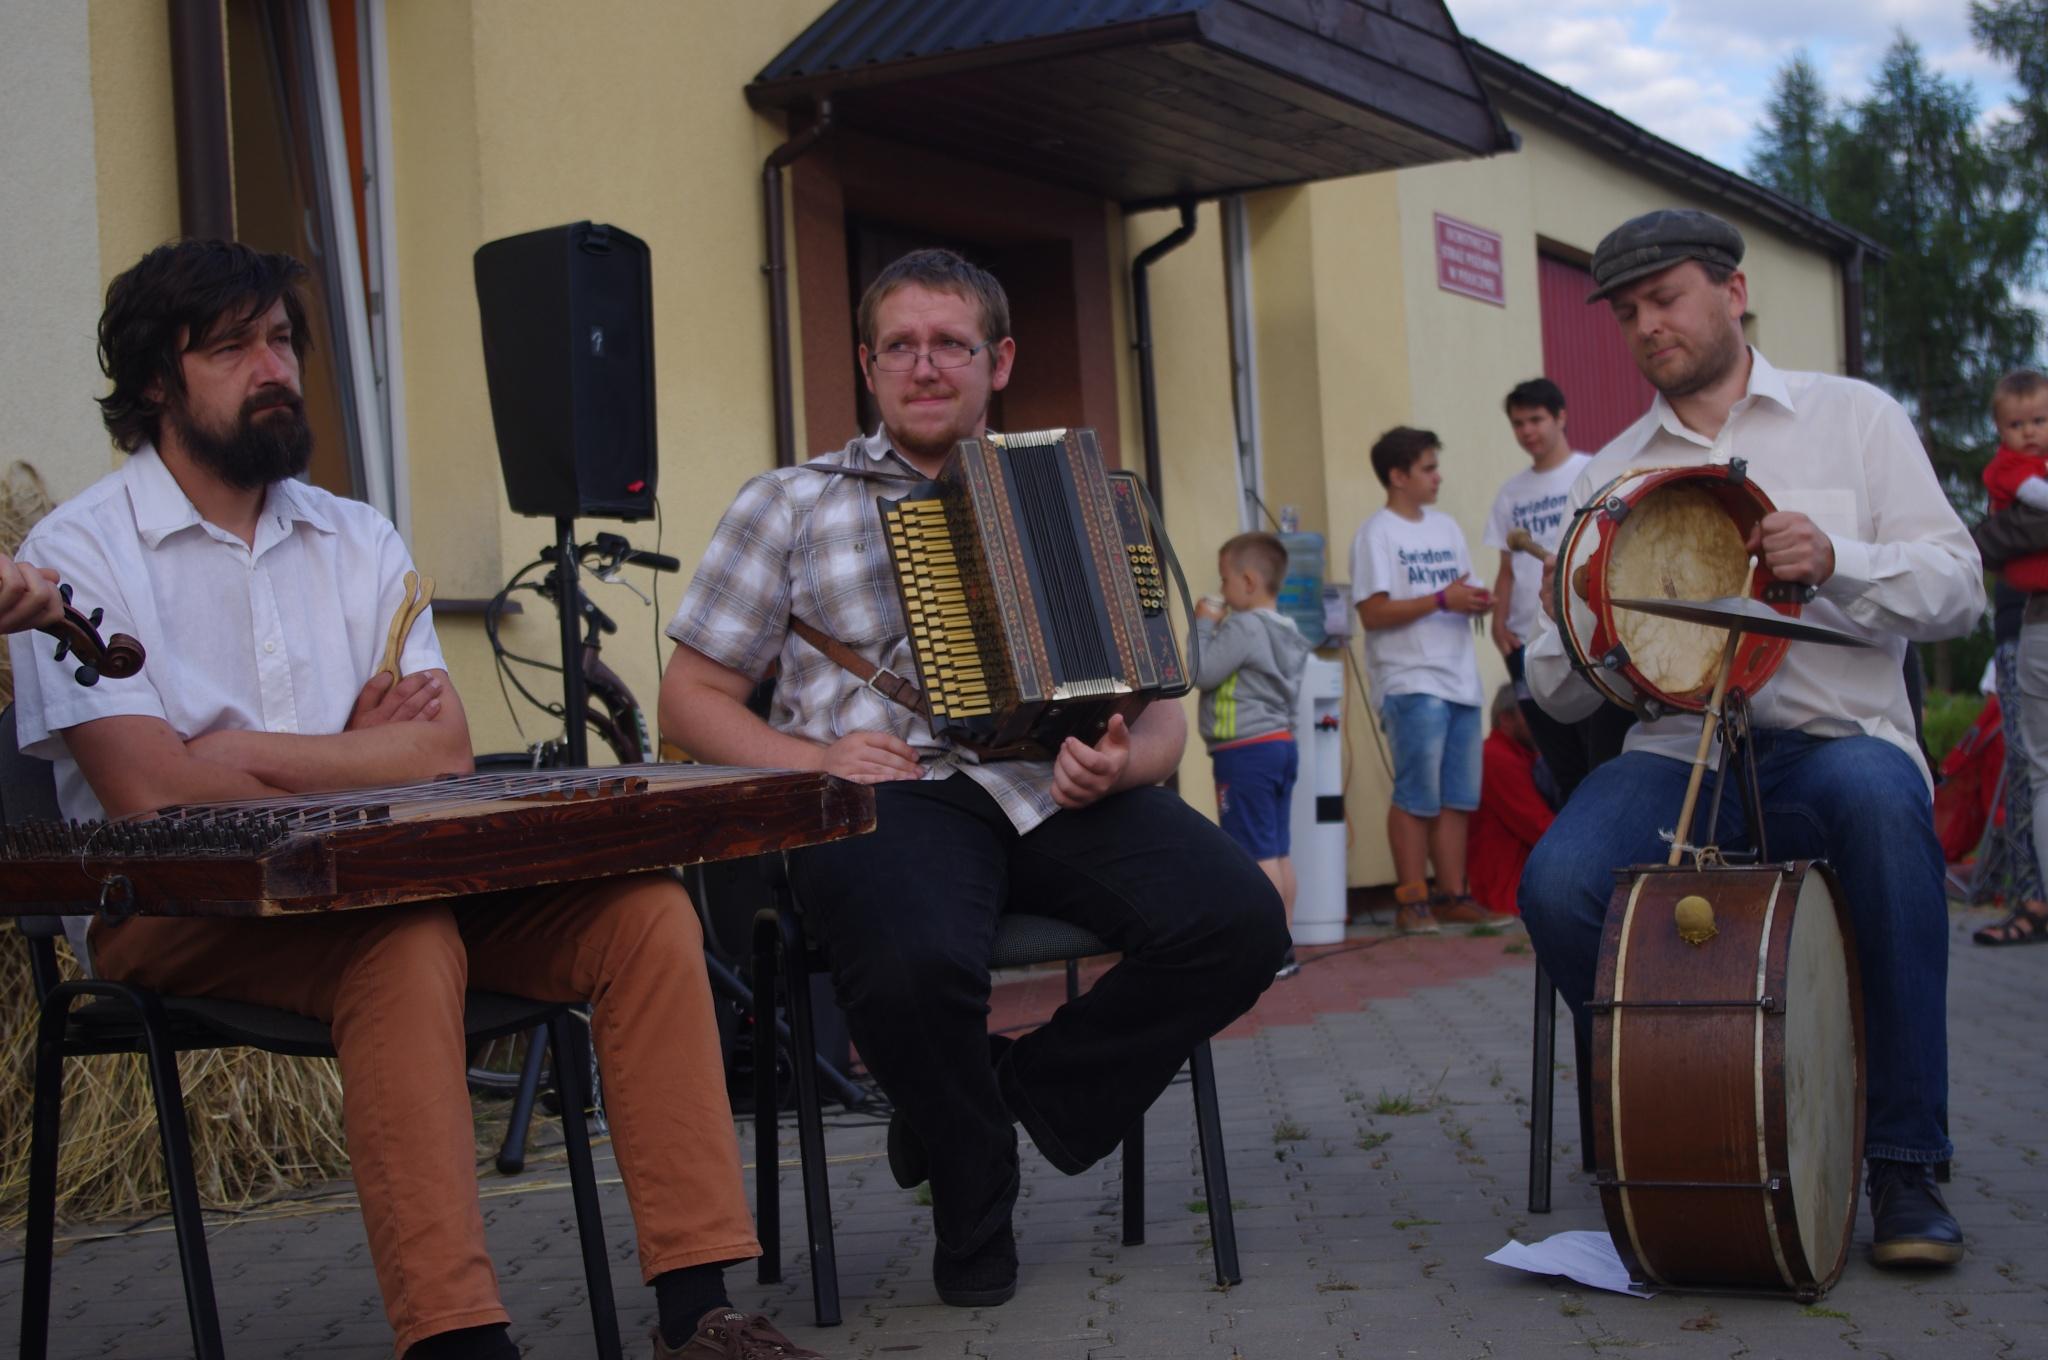 IMGP0160 fot. Sławomir Kulik